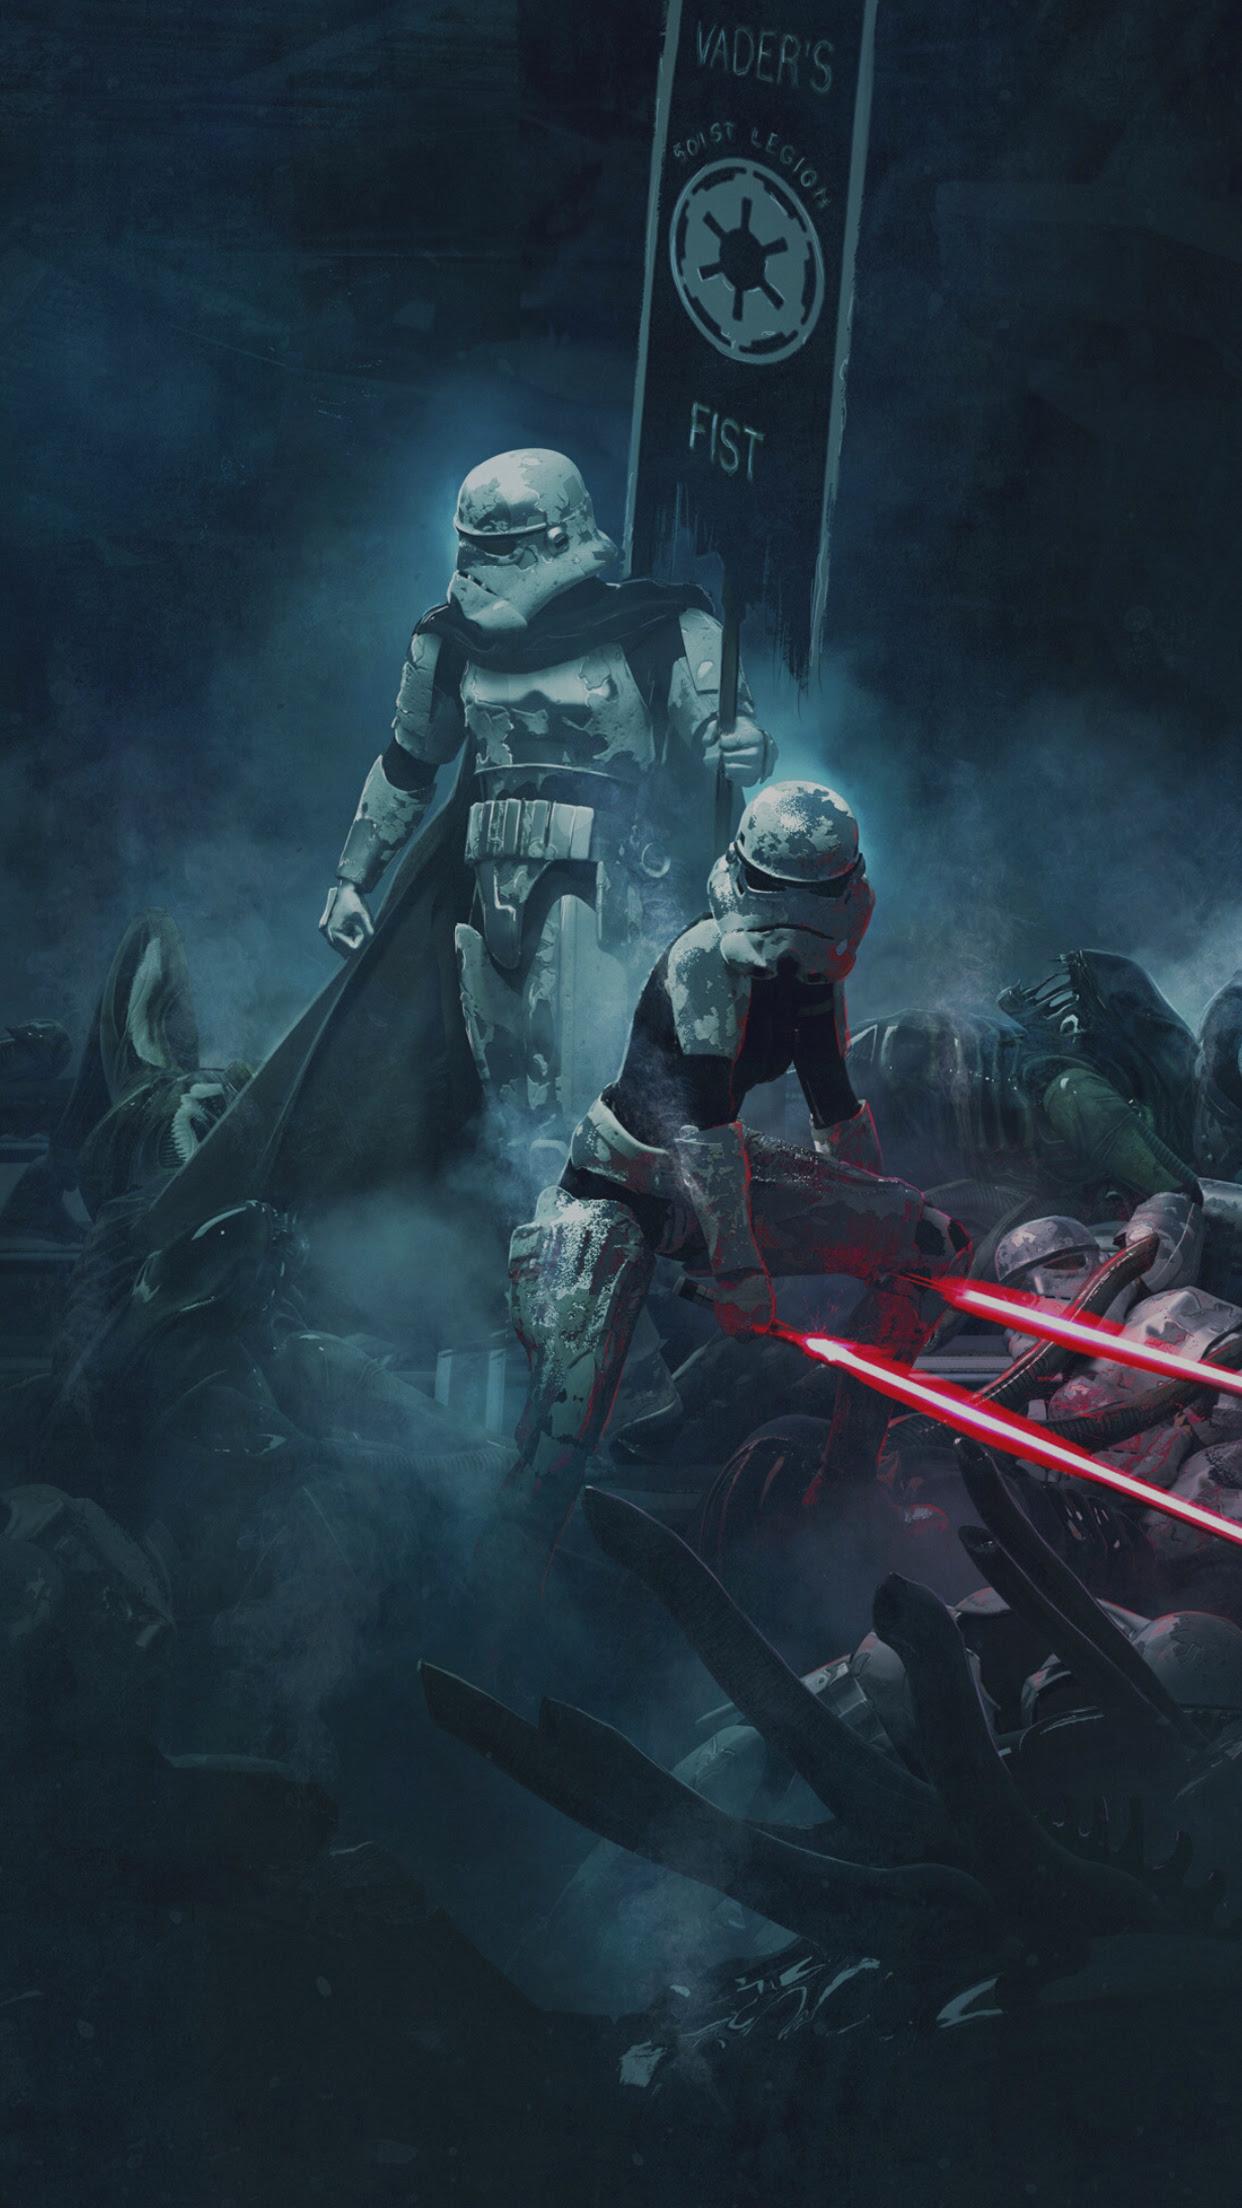 Awakens The Force Star Wars Stormtrooper Wallpaper Iphone